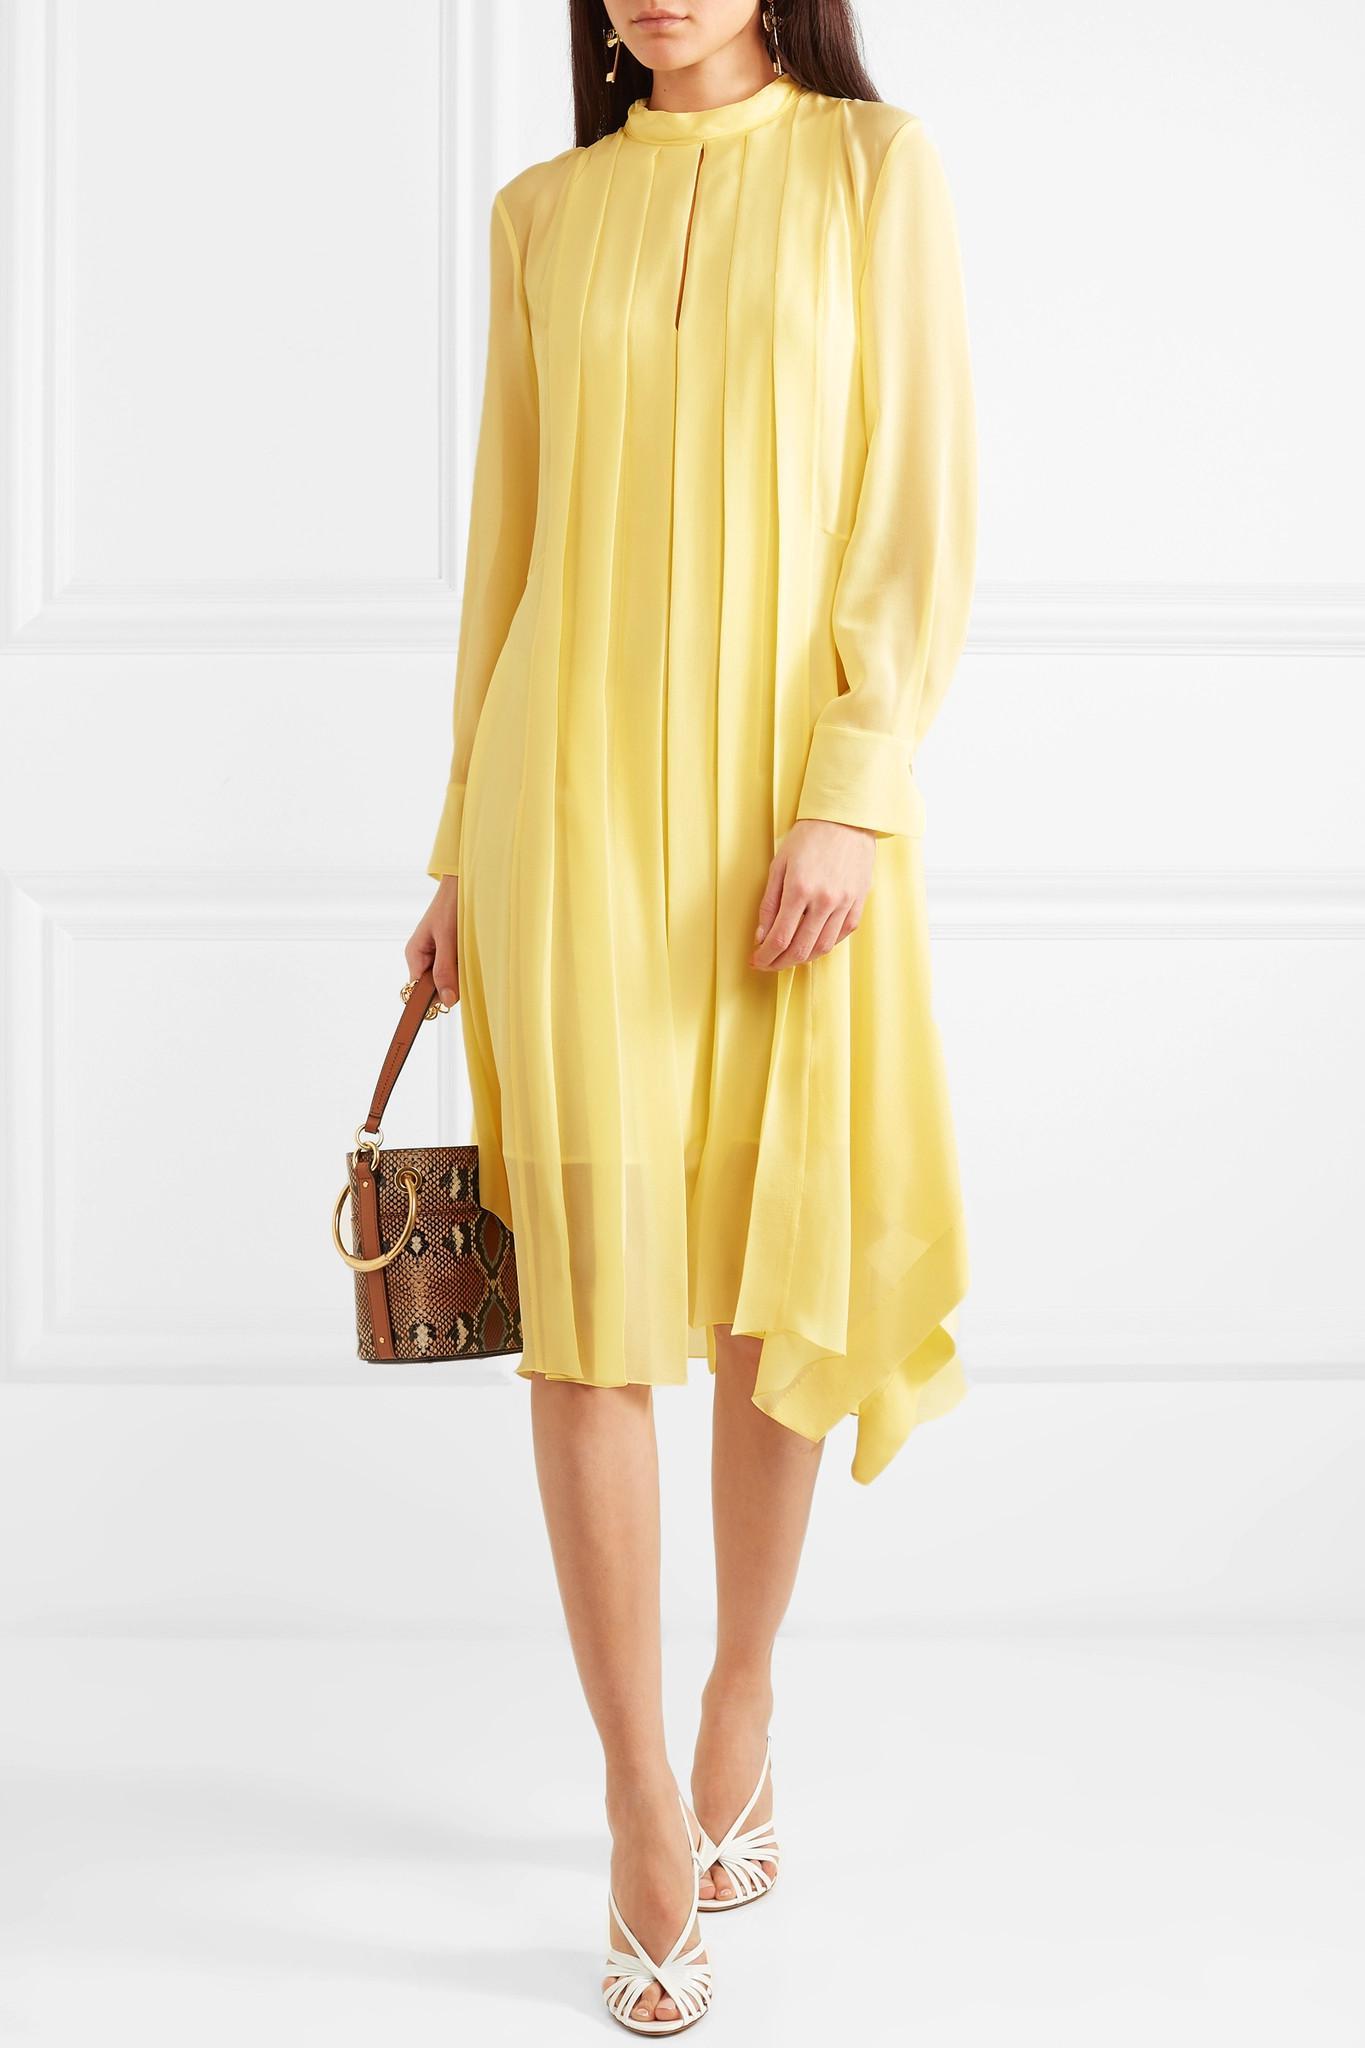 7a74cf6950 Chloé - Yellow Pleated Silk-chiffon Dress - Lyst. View fullscreen